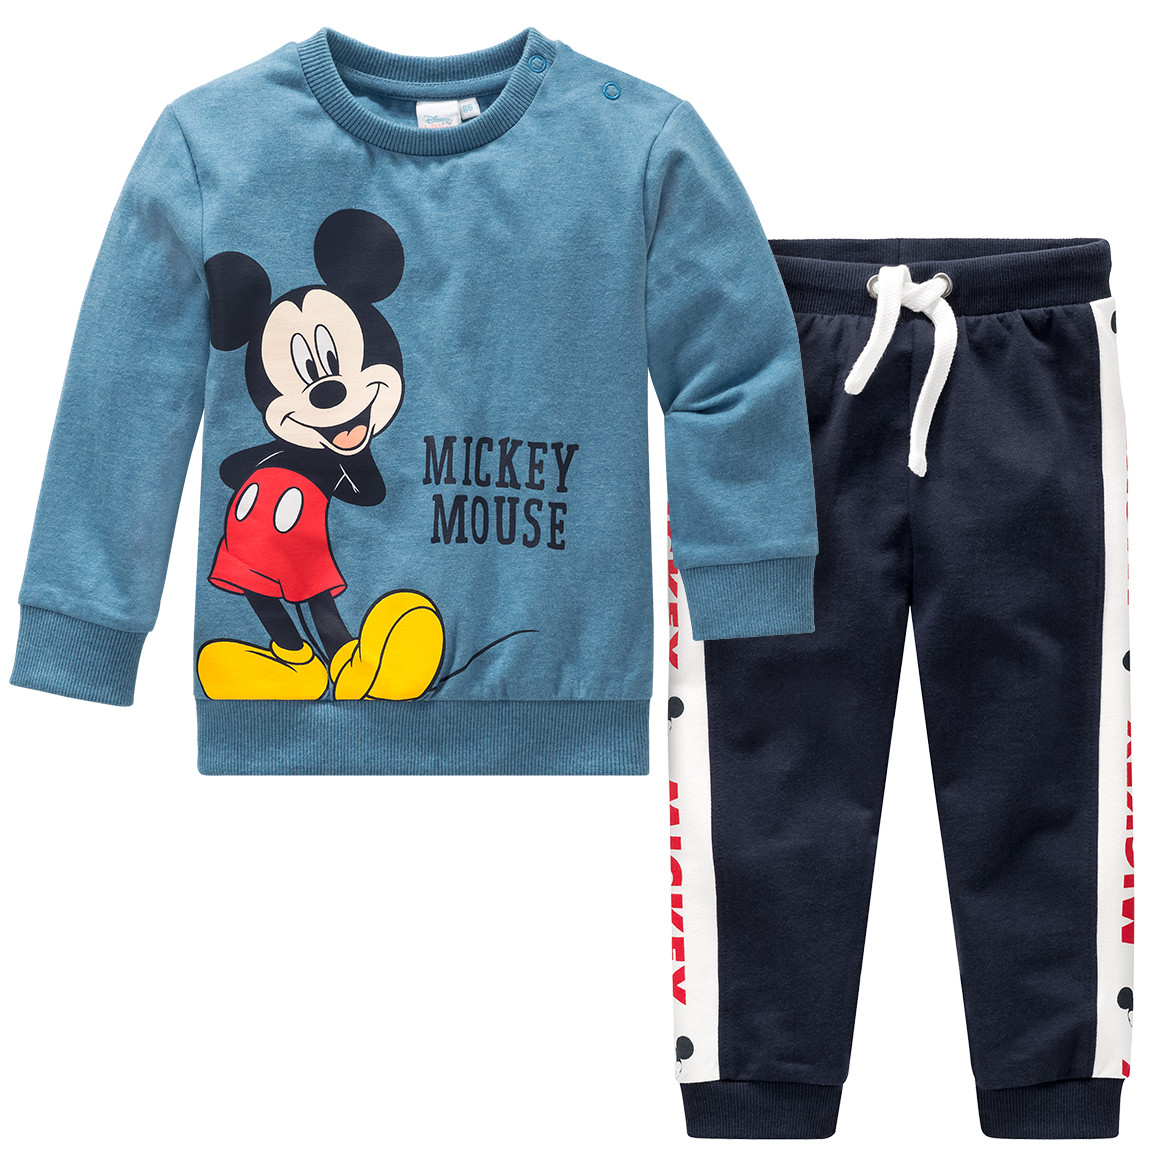 Babysets - Micky Maus Sweatshirt und Jogginghose im Set - Onlineshop Ernstings family